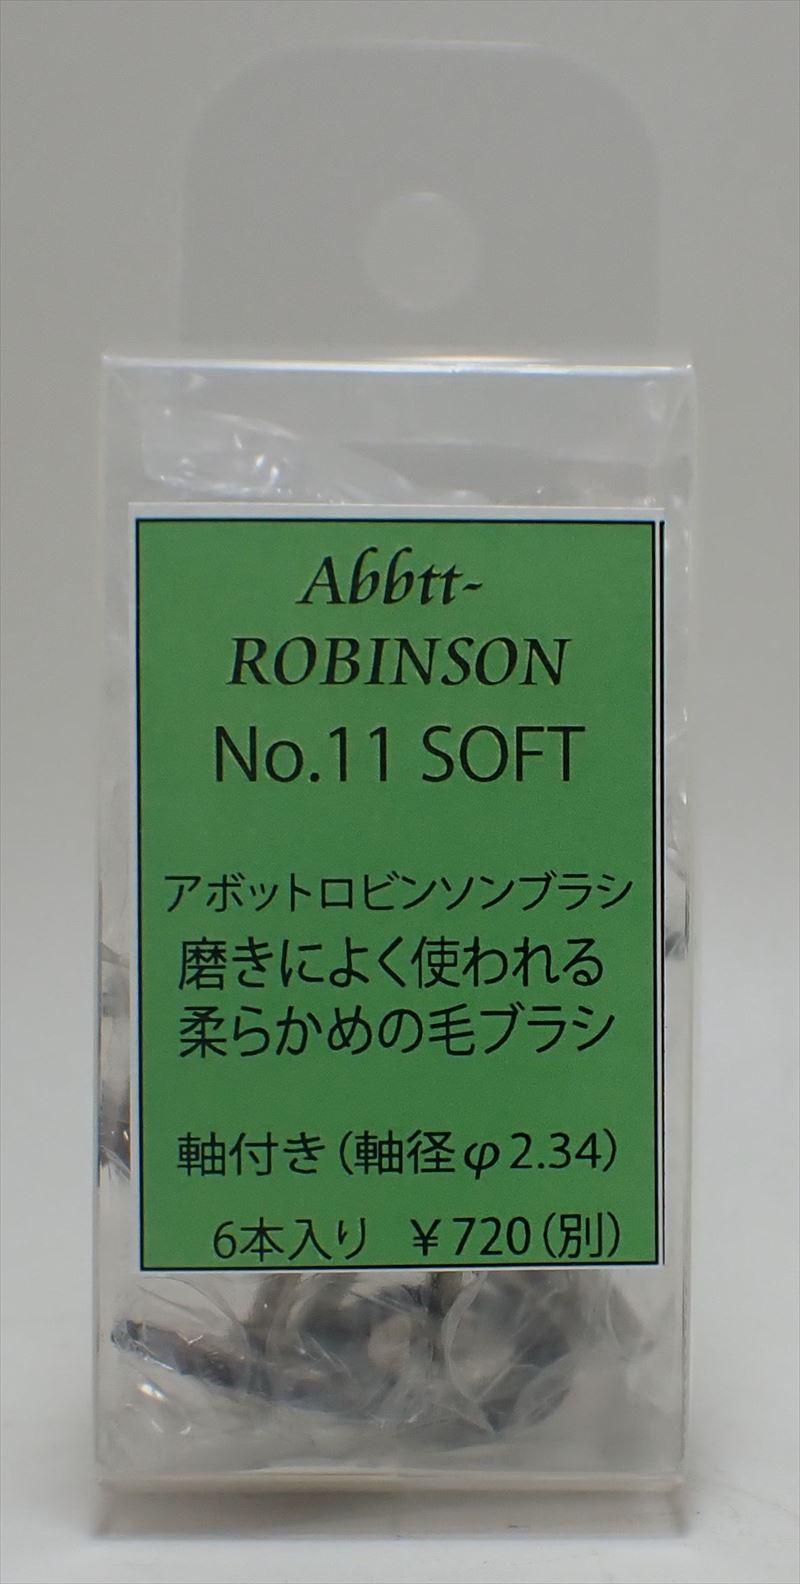 bp1261 Abbtt-ROBINSON BRUSH ロビンソンブラシ(6本入り)